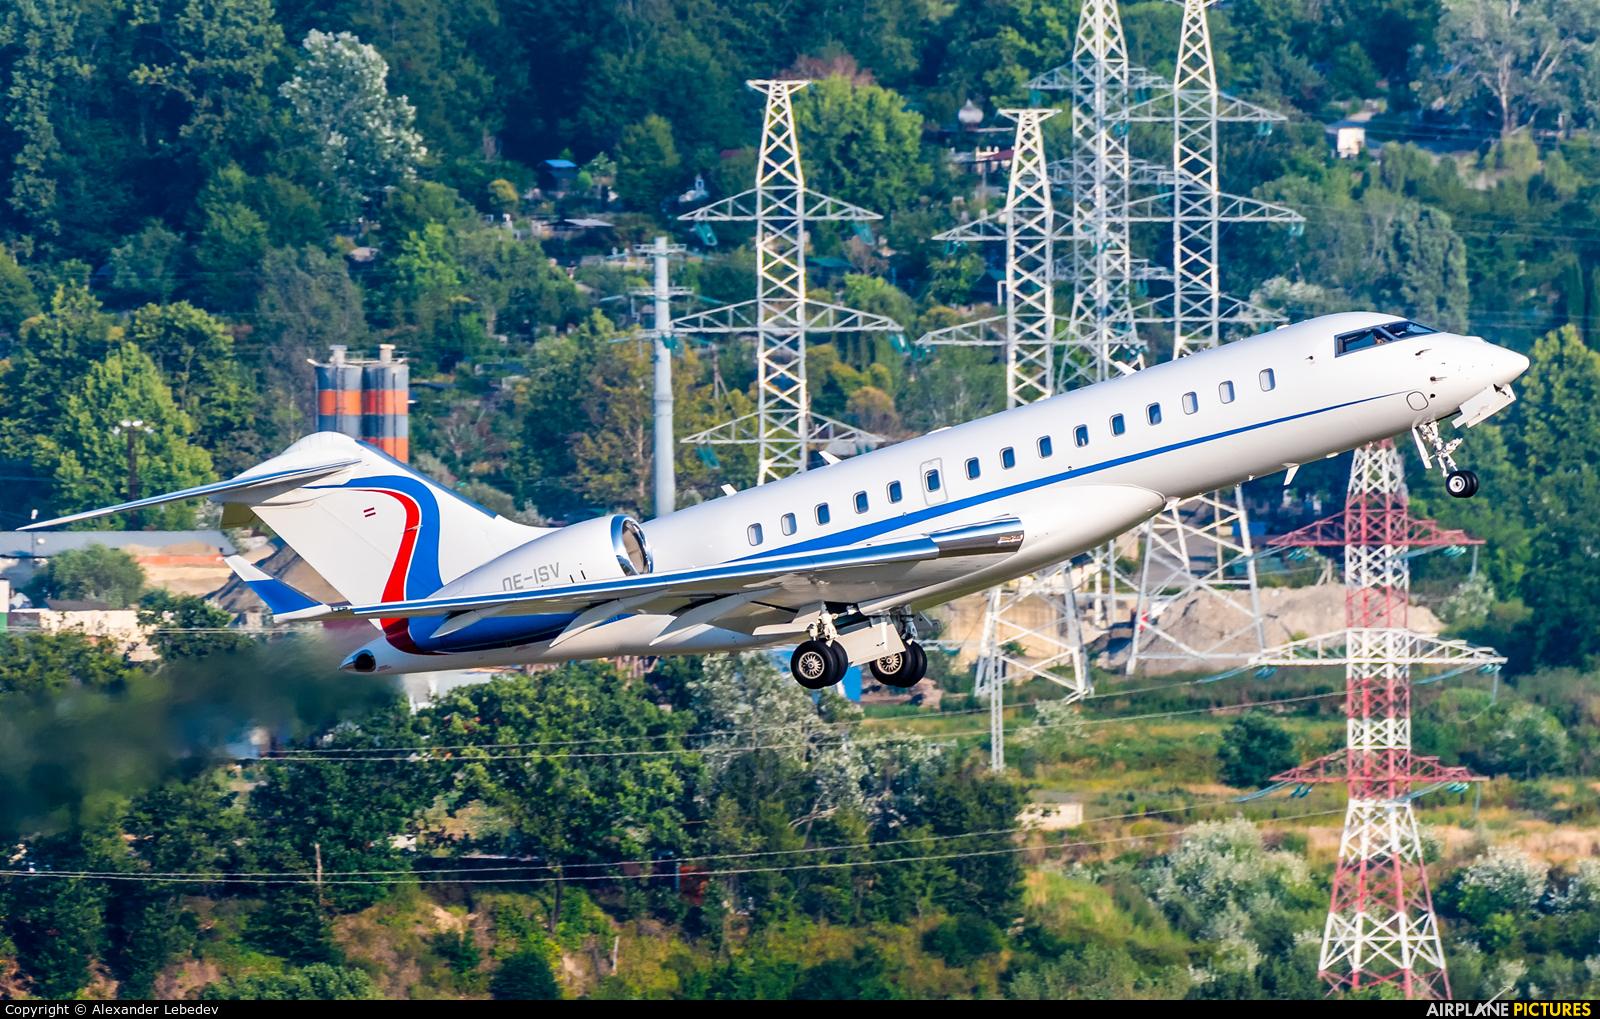 Avcon Jet OE-ISV aircraft at Sochi Intl